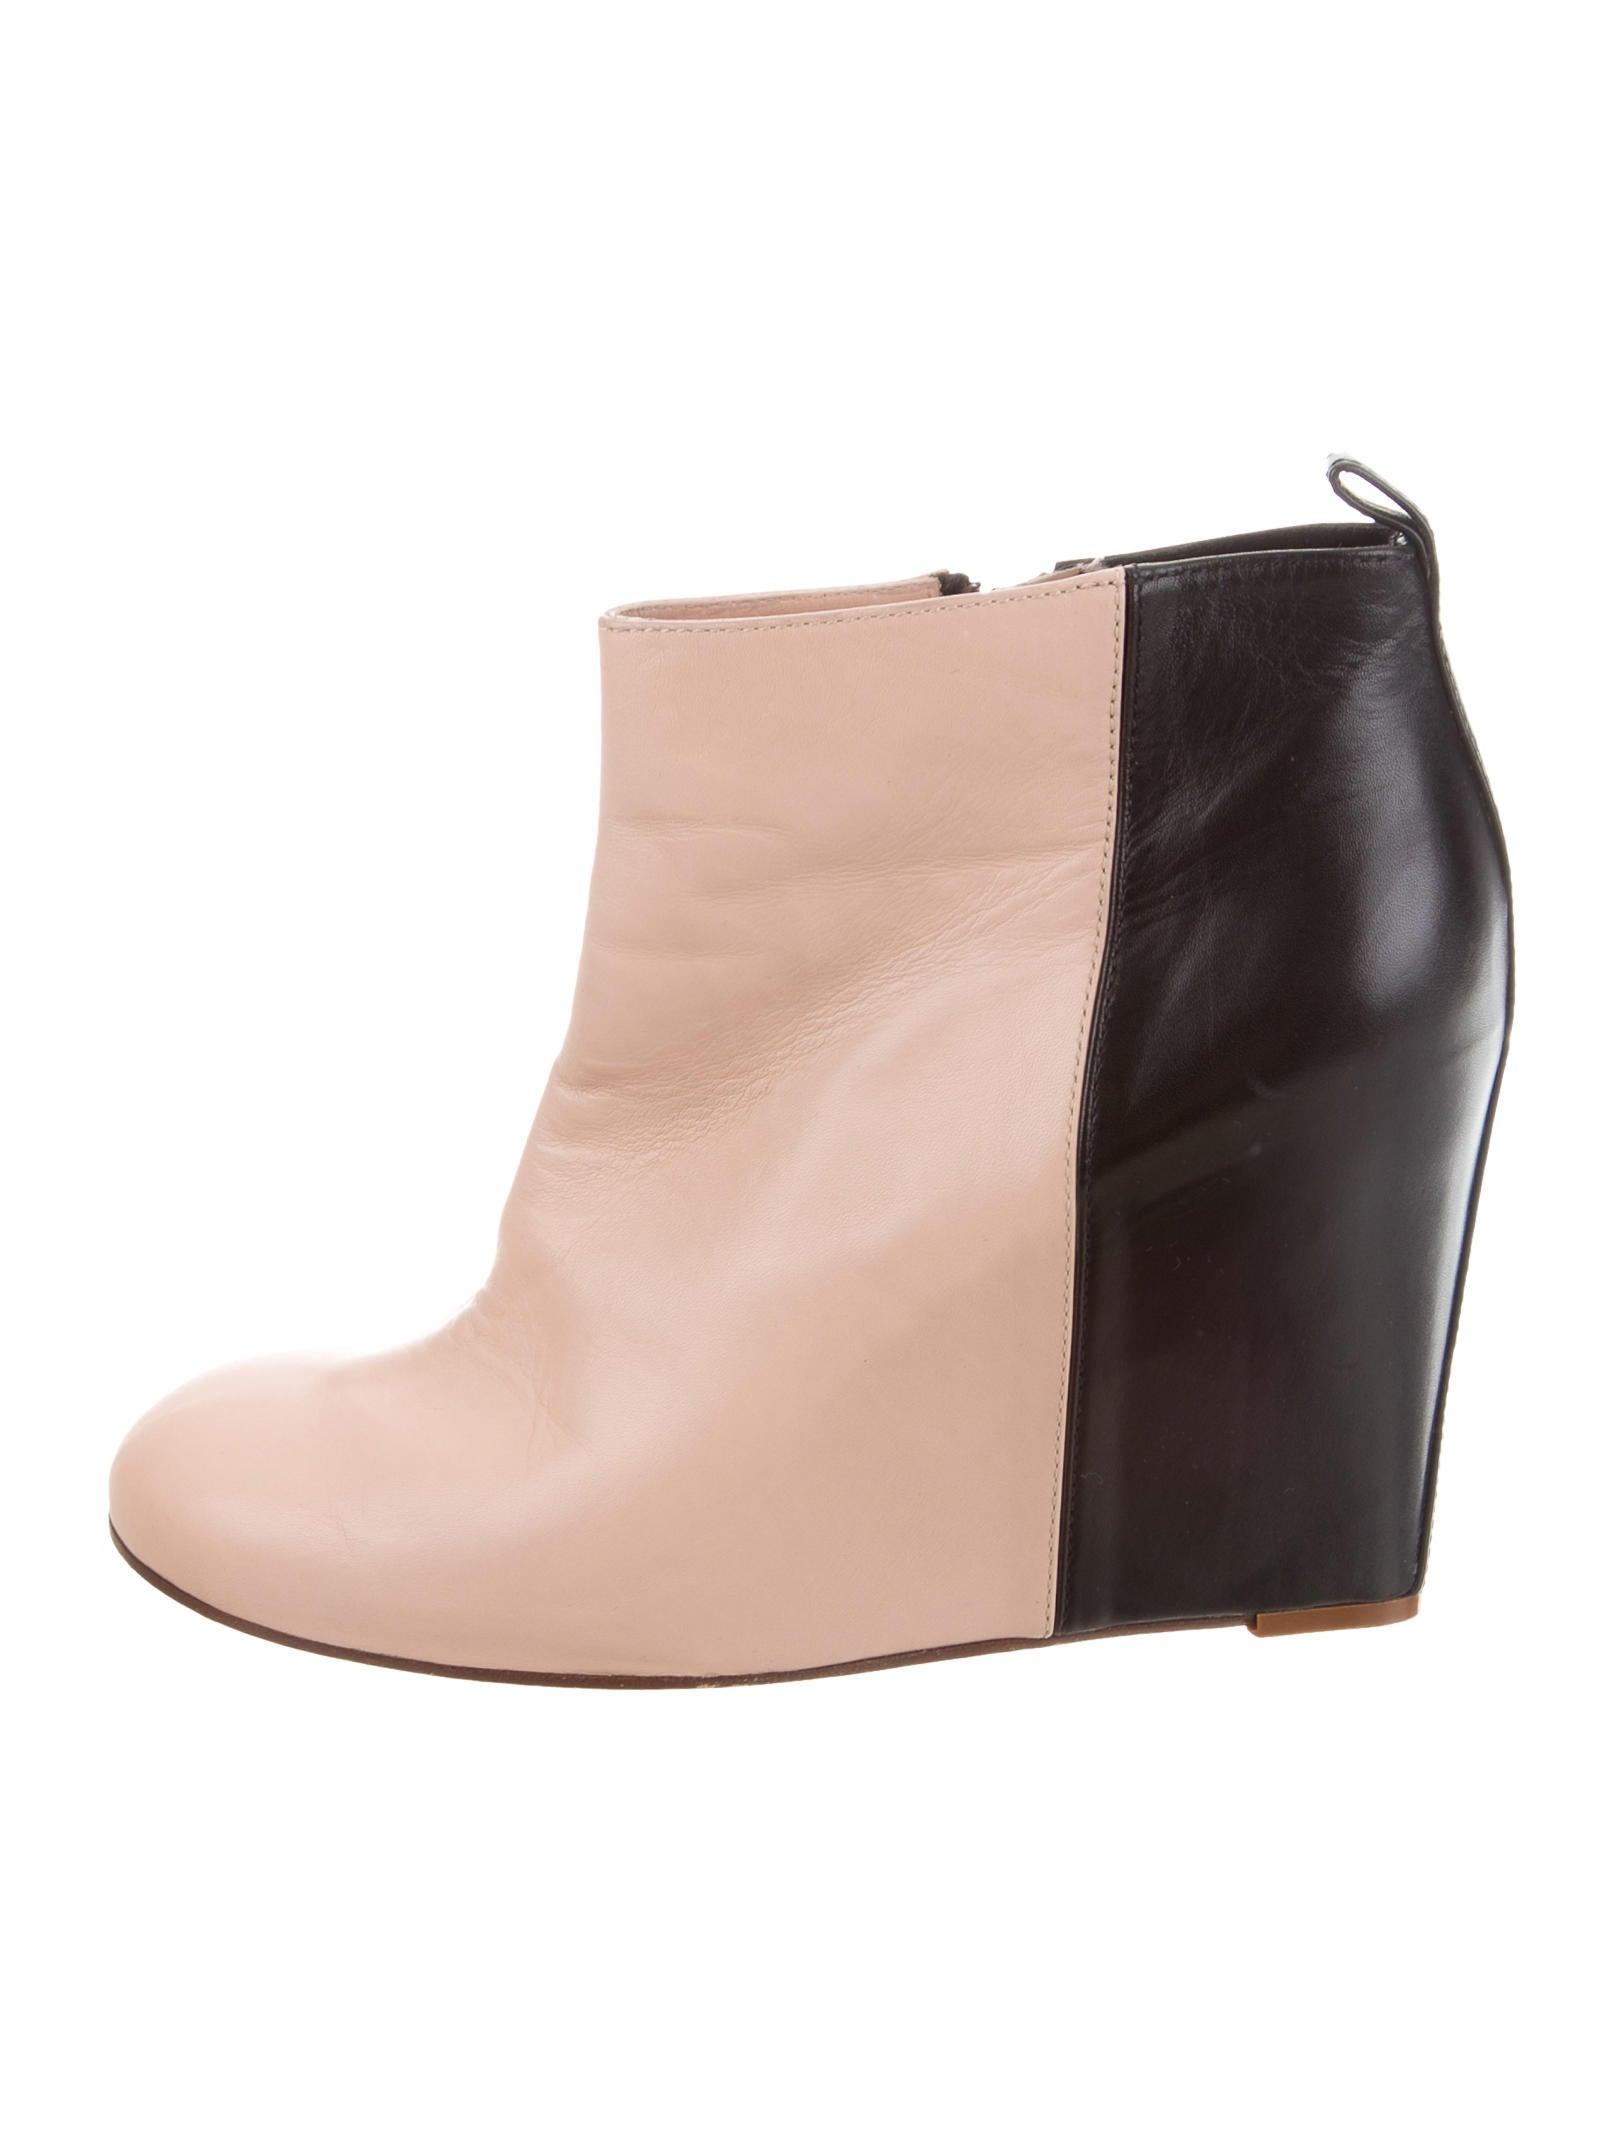 genuine cheap online Céline Leather Wedge Booties discount big sale discount store wKhFnT0udl